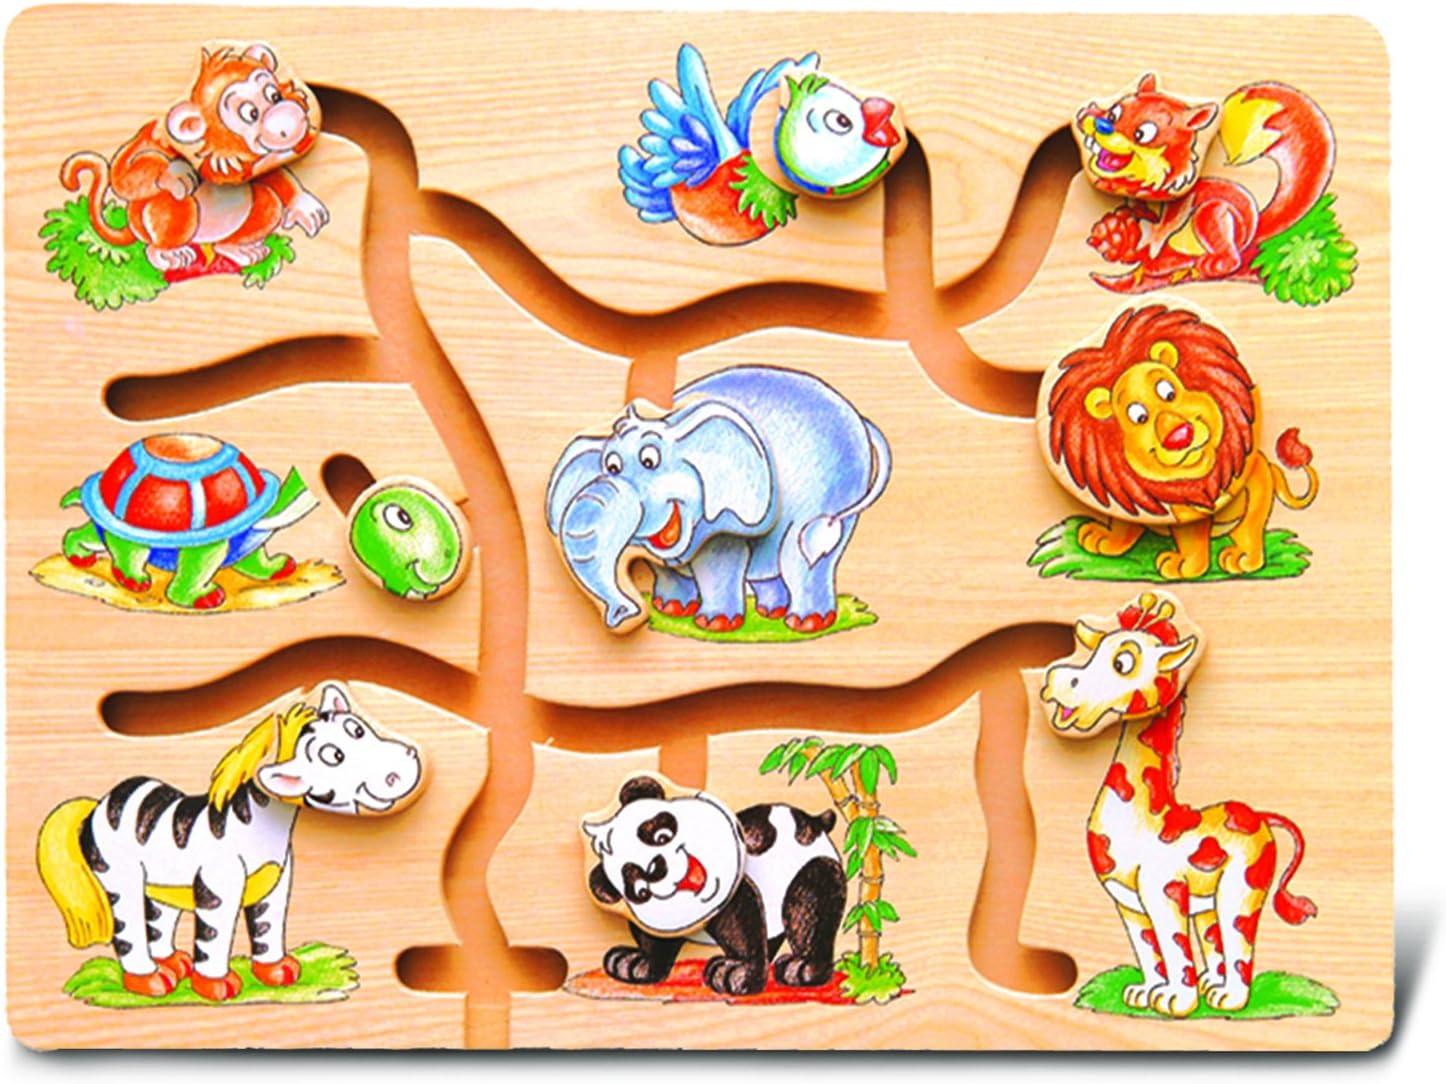 Amazon.com: Maze Puzzle - Animals: Toys & Games